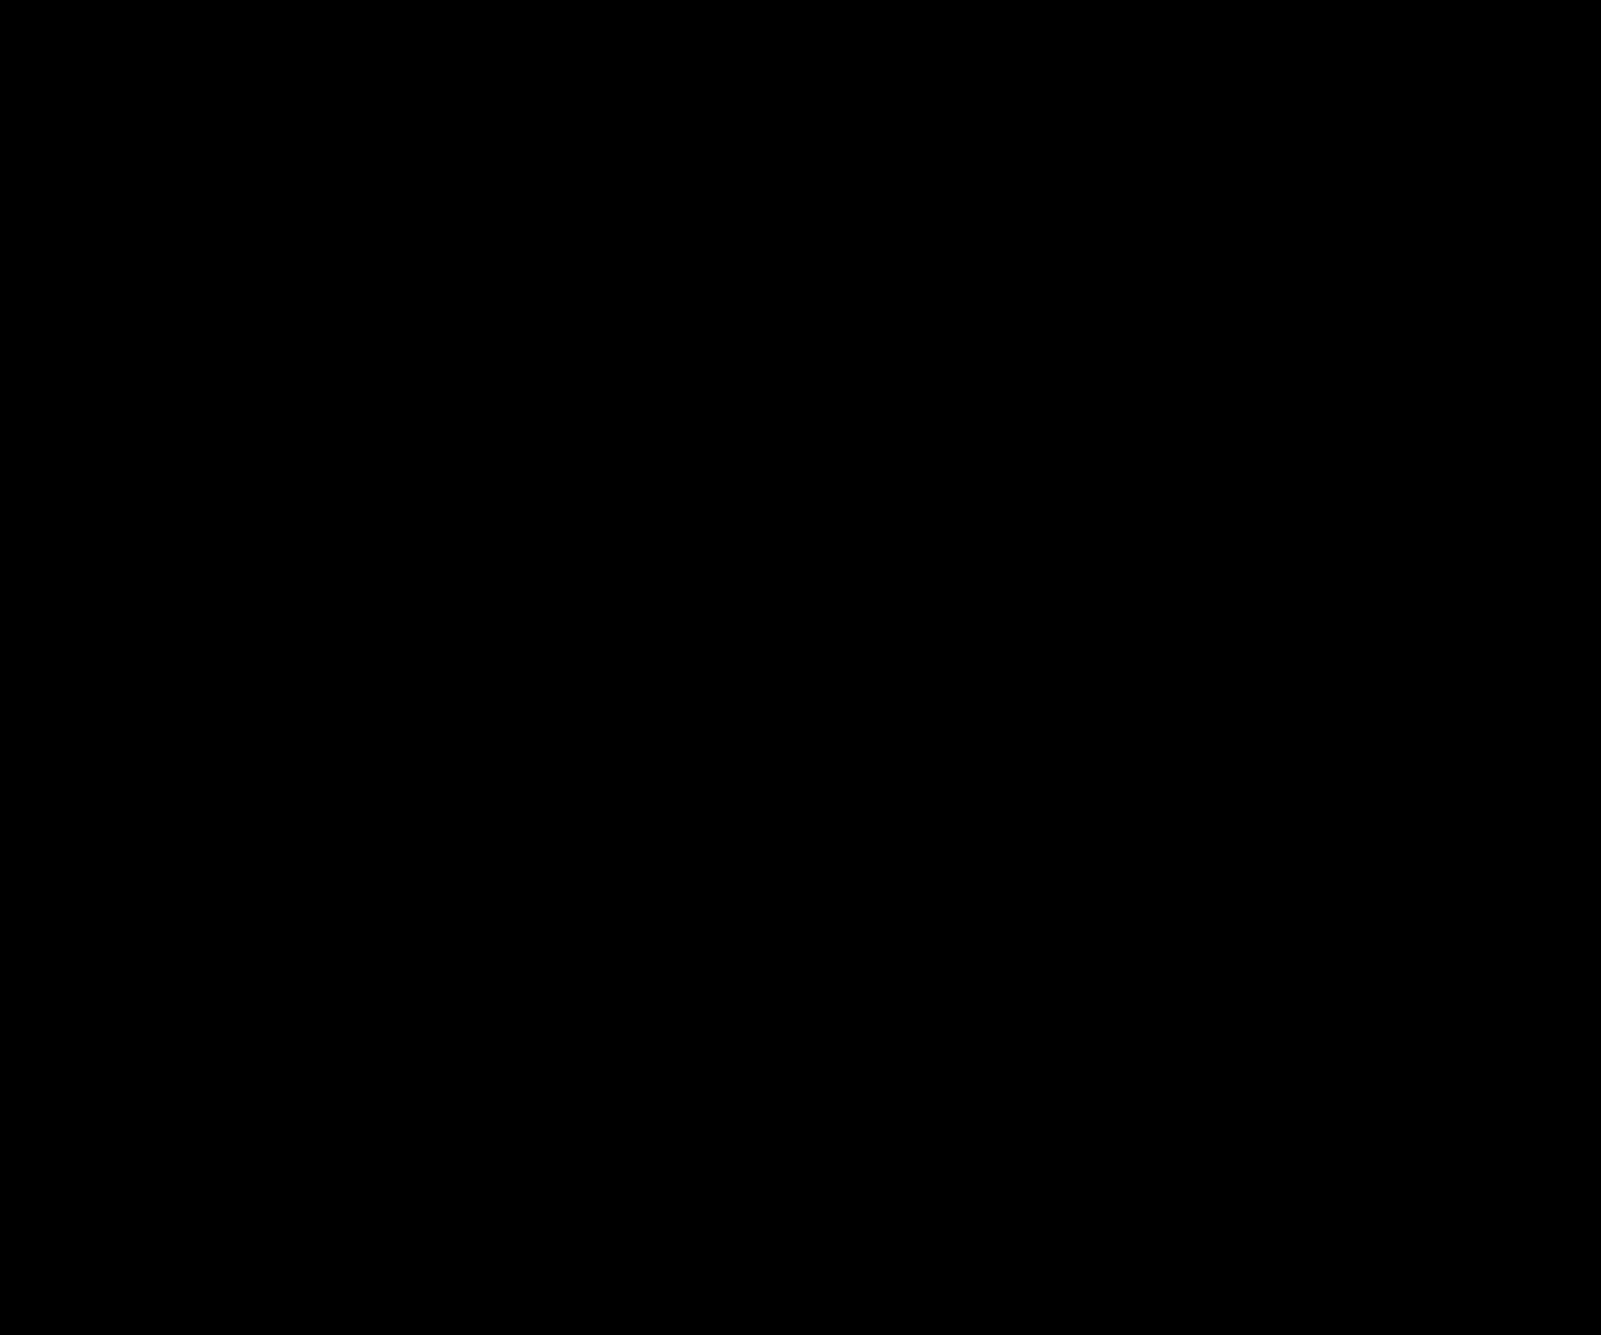 download hd png 50 px garena free fire logo transparent png image nicepng com hd png 50 px garena free fire logo